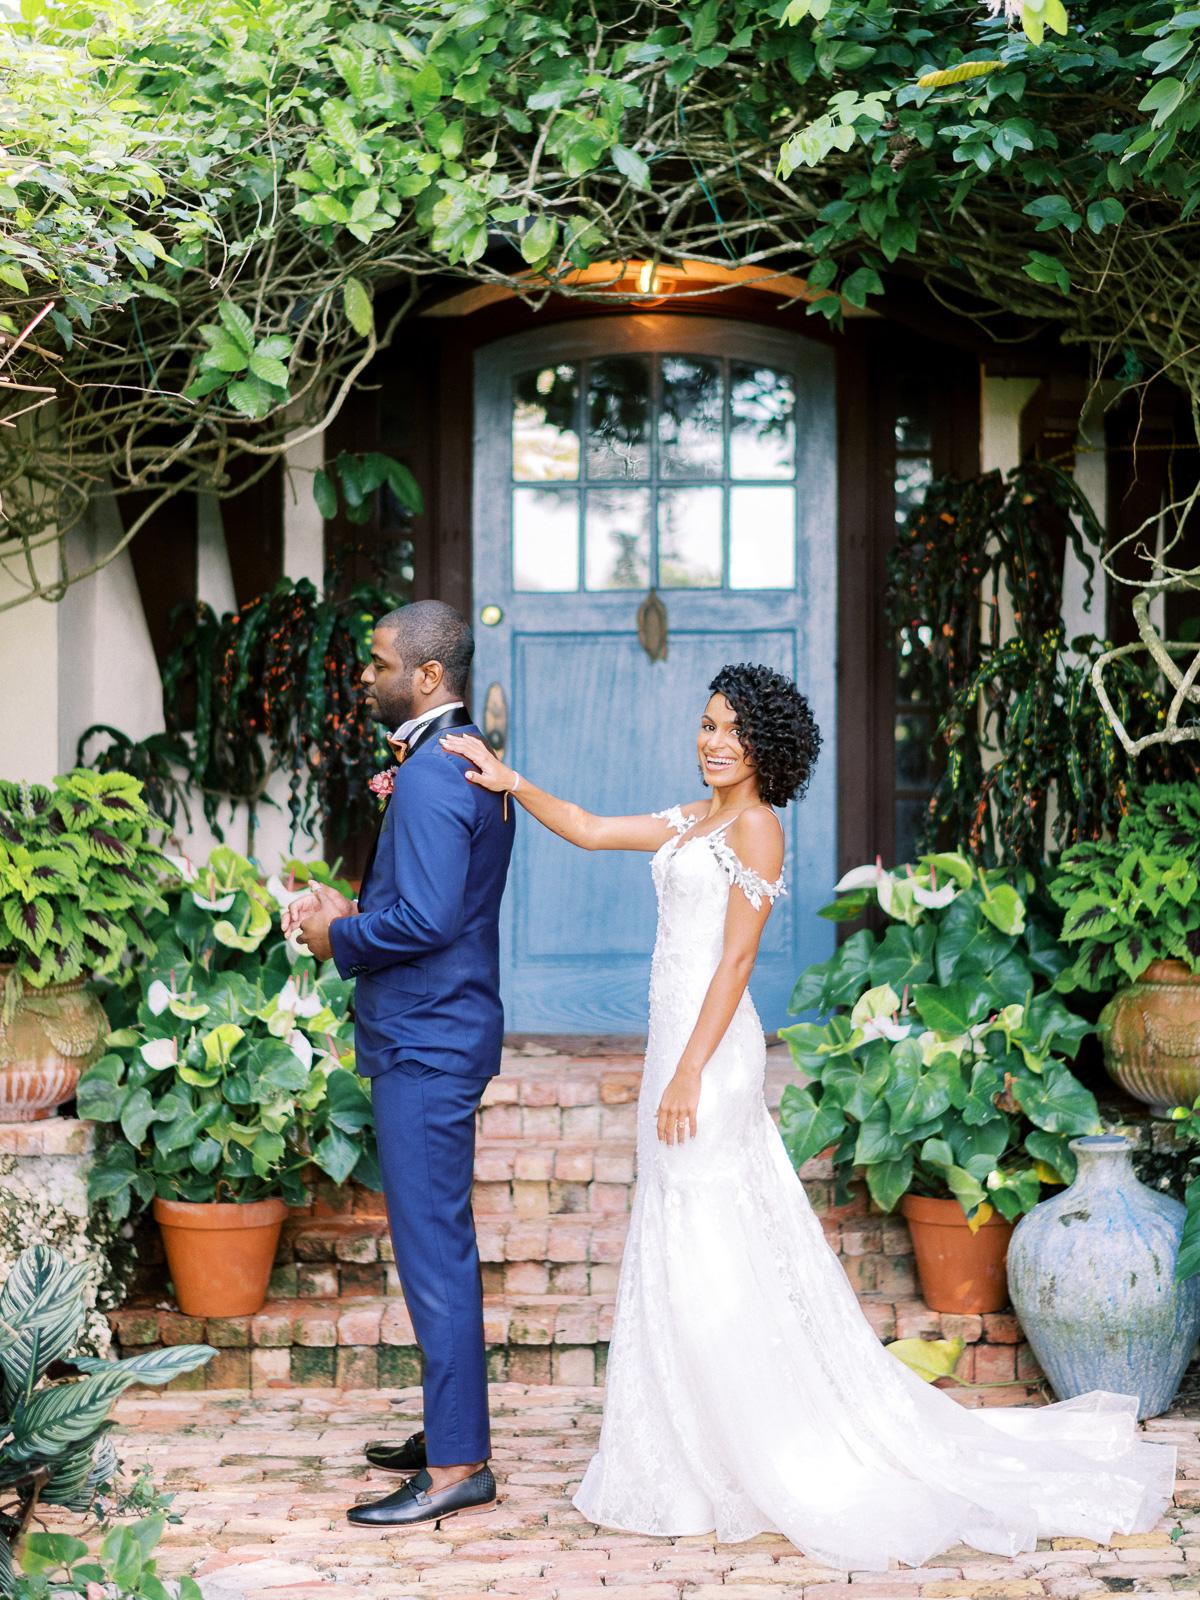 melissa lindsey wedding first look bride tapping groom shoulder